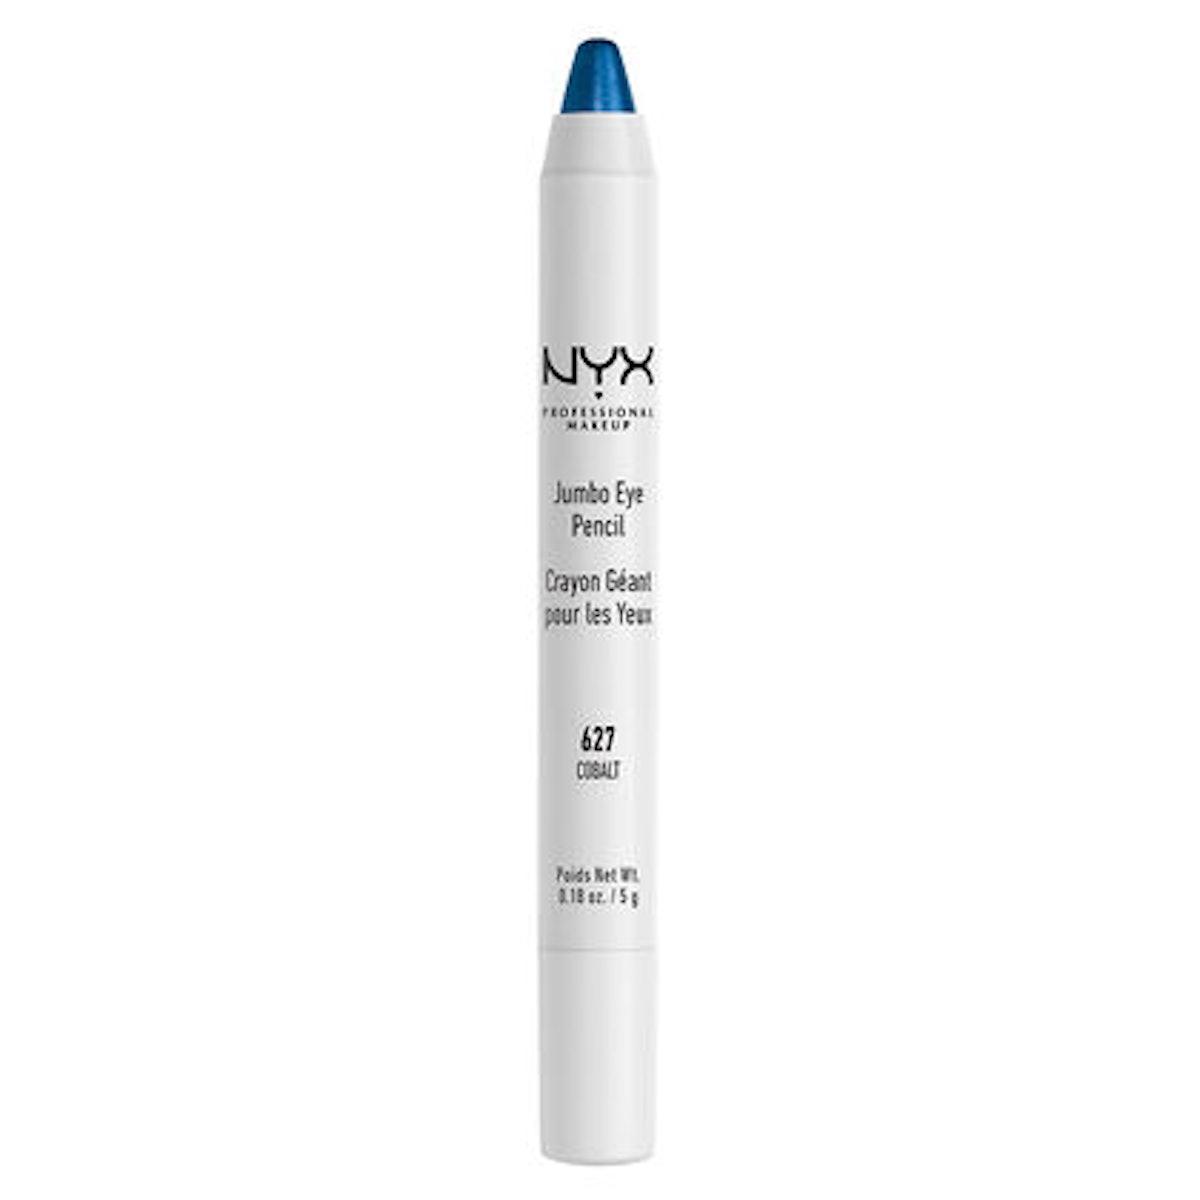 NYX's Jumbo Eye Pencil in Dark Blue